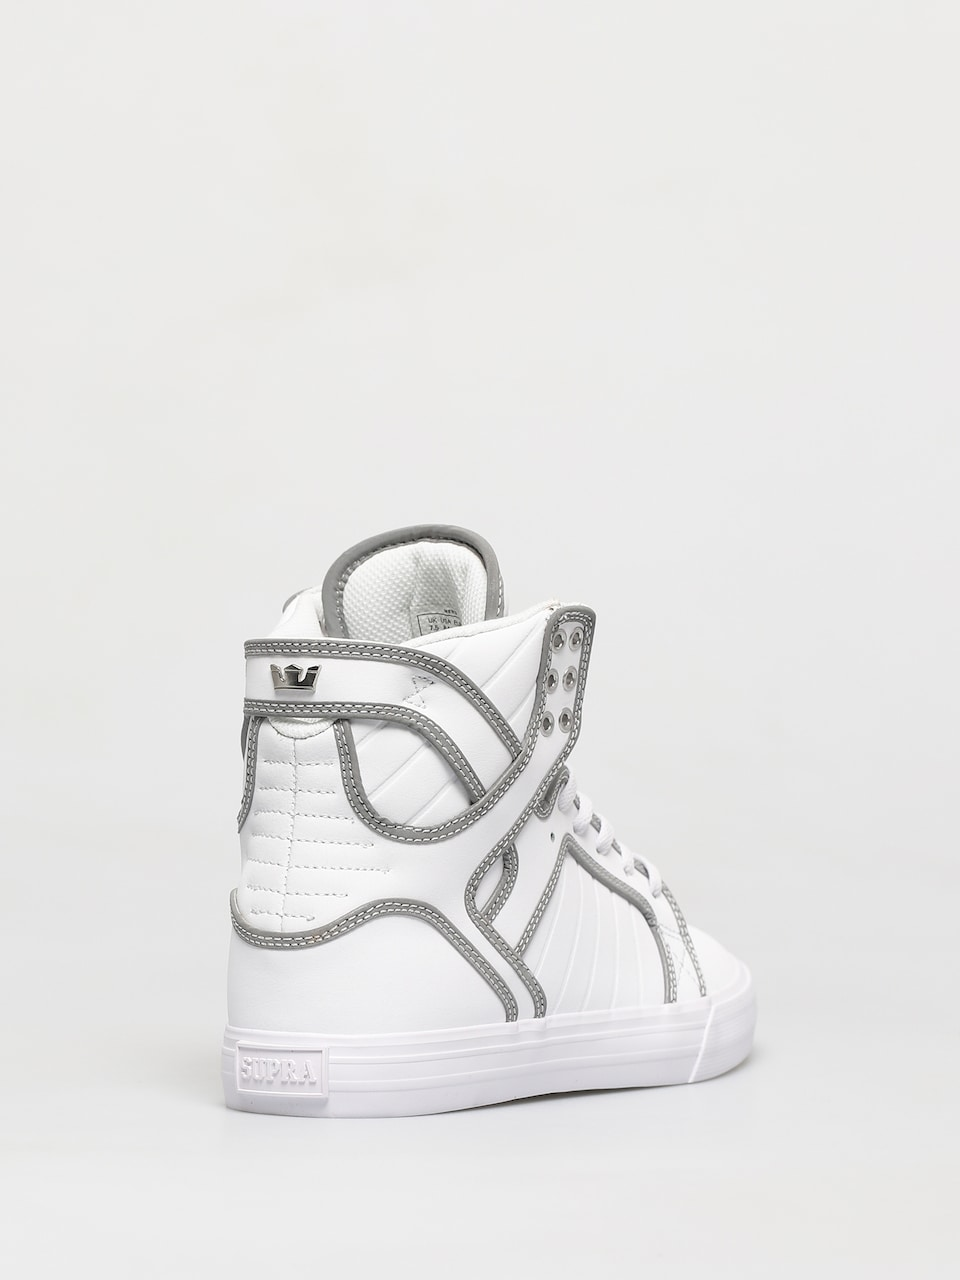 Supra Skytop Shoes (whitereflect white)